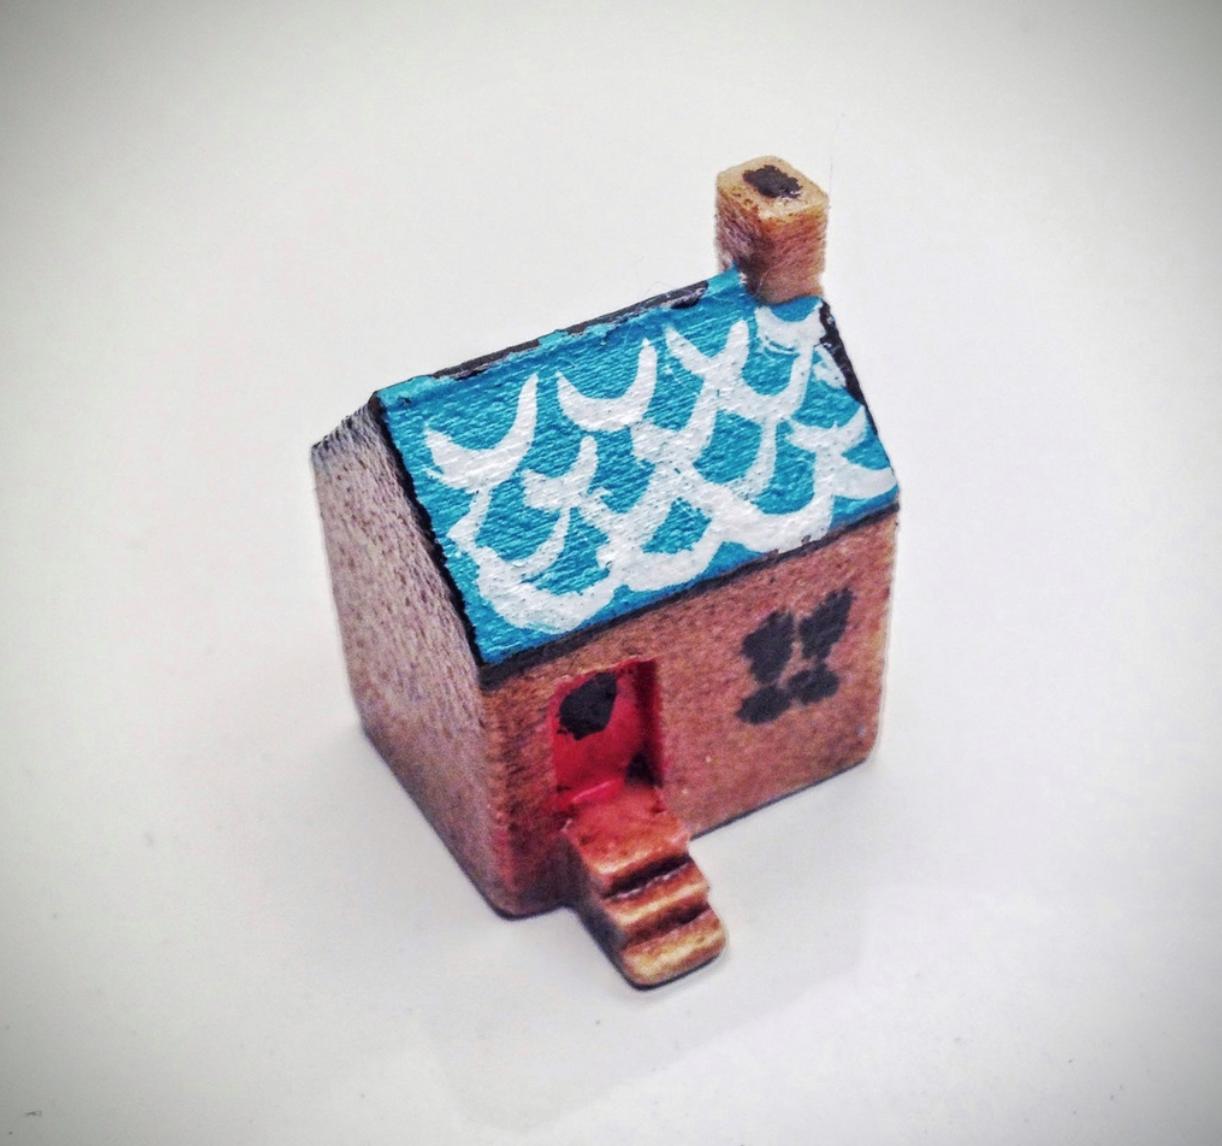 Capture d'écran 2017-10-24 à 14.20.23.png Download free STL file Simple tiny house • 3D printing model, tone001